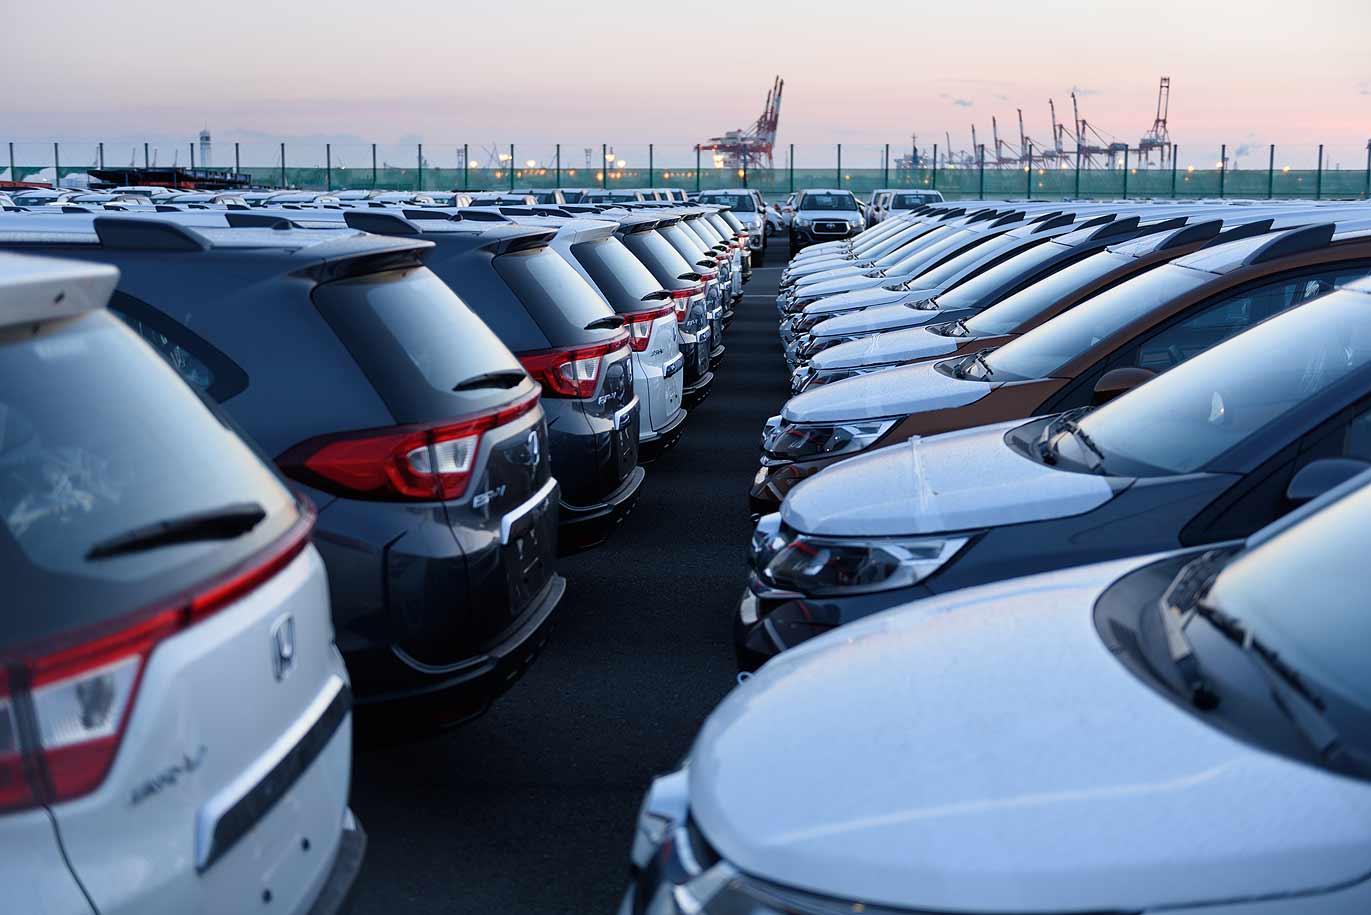 Auto industry unites to oppose Trump import tariffs